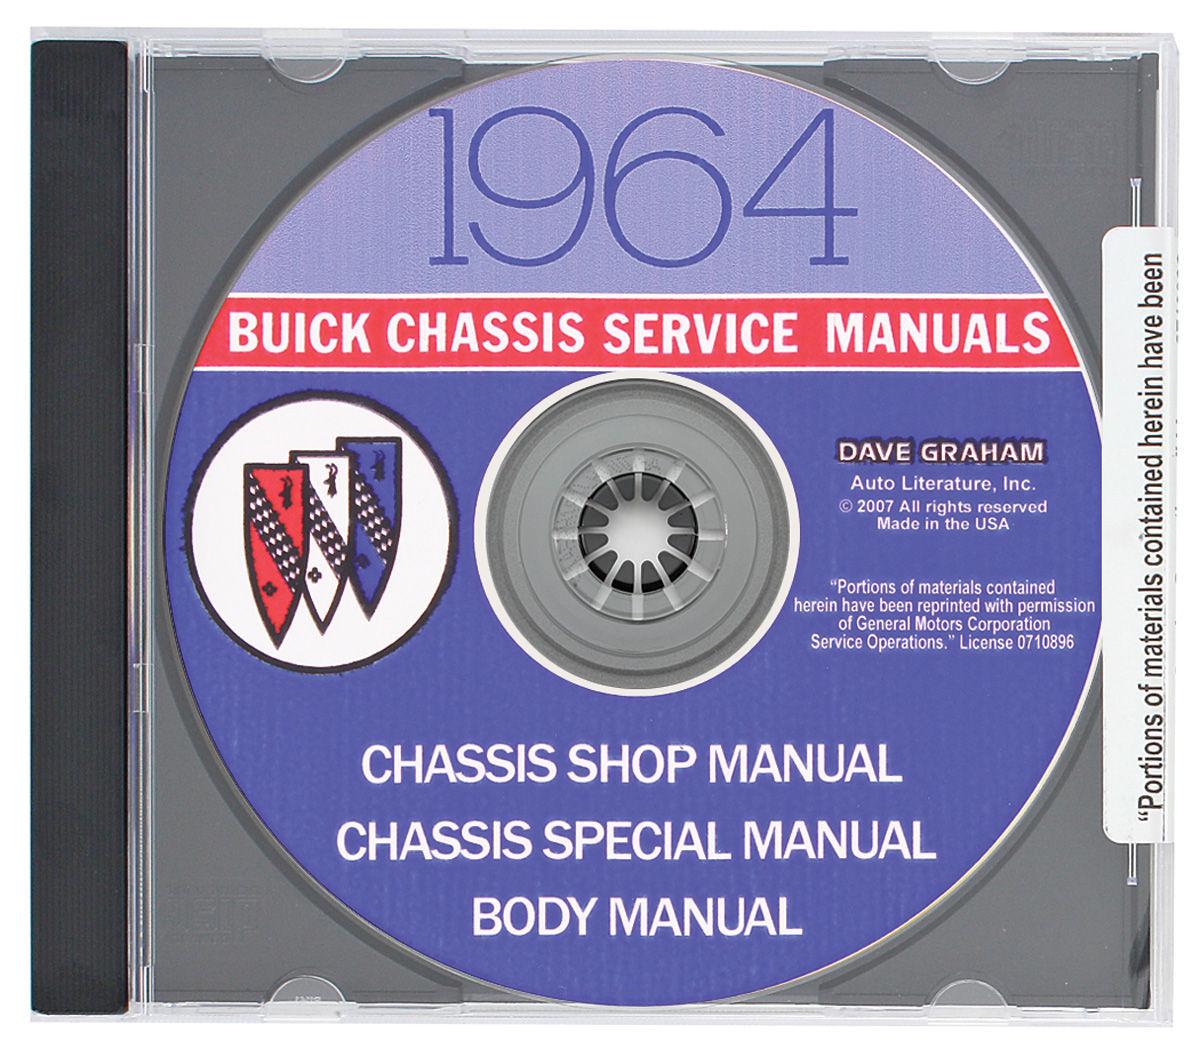 buick factory shop manuals on cd rom. Black Bedroom Furniture Sets. Home Design Ideas